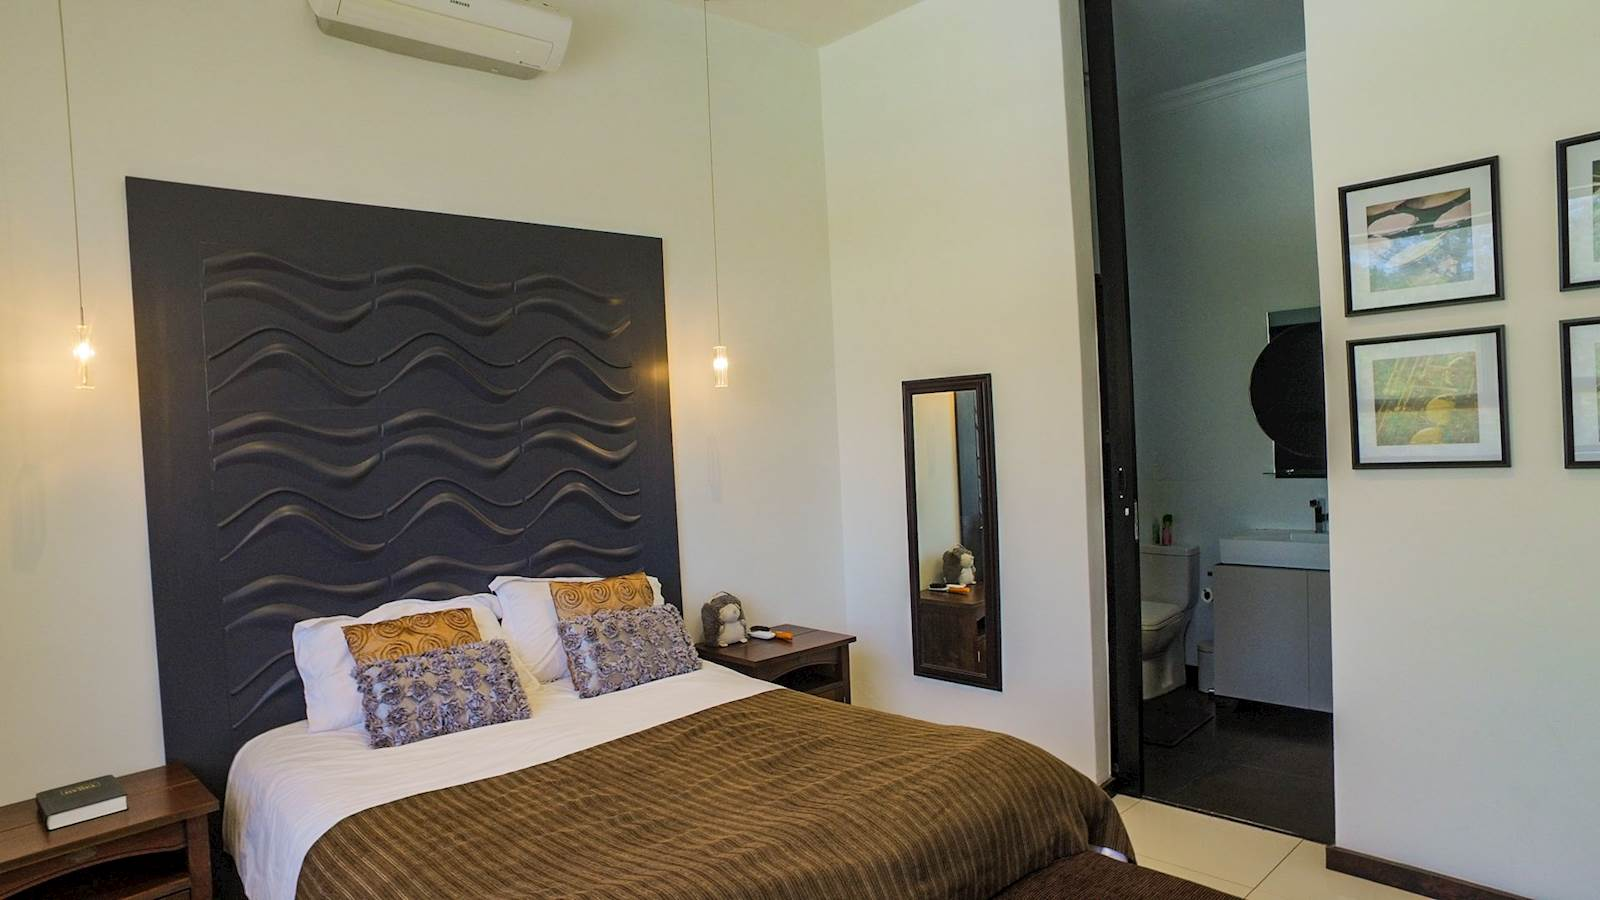 3 Bedroom House sold in Waterkloof Ridge ENT0010698 : photo#12